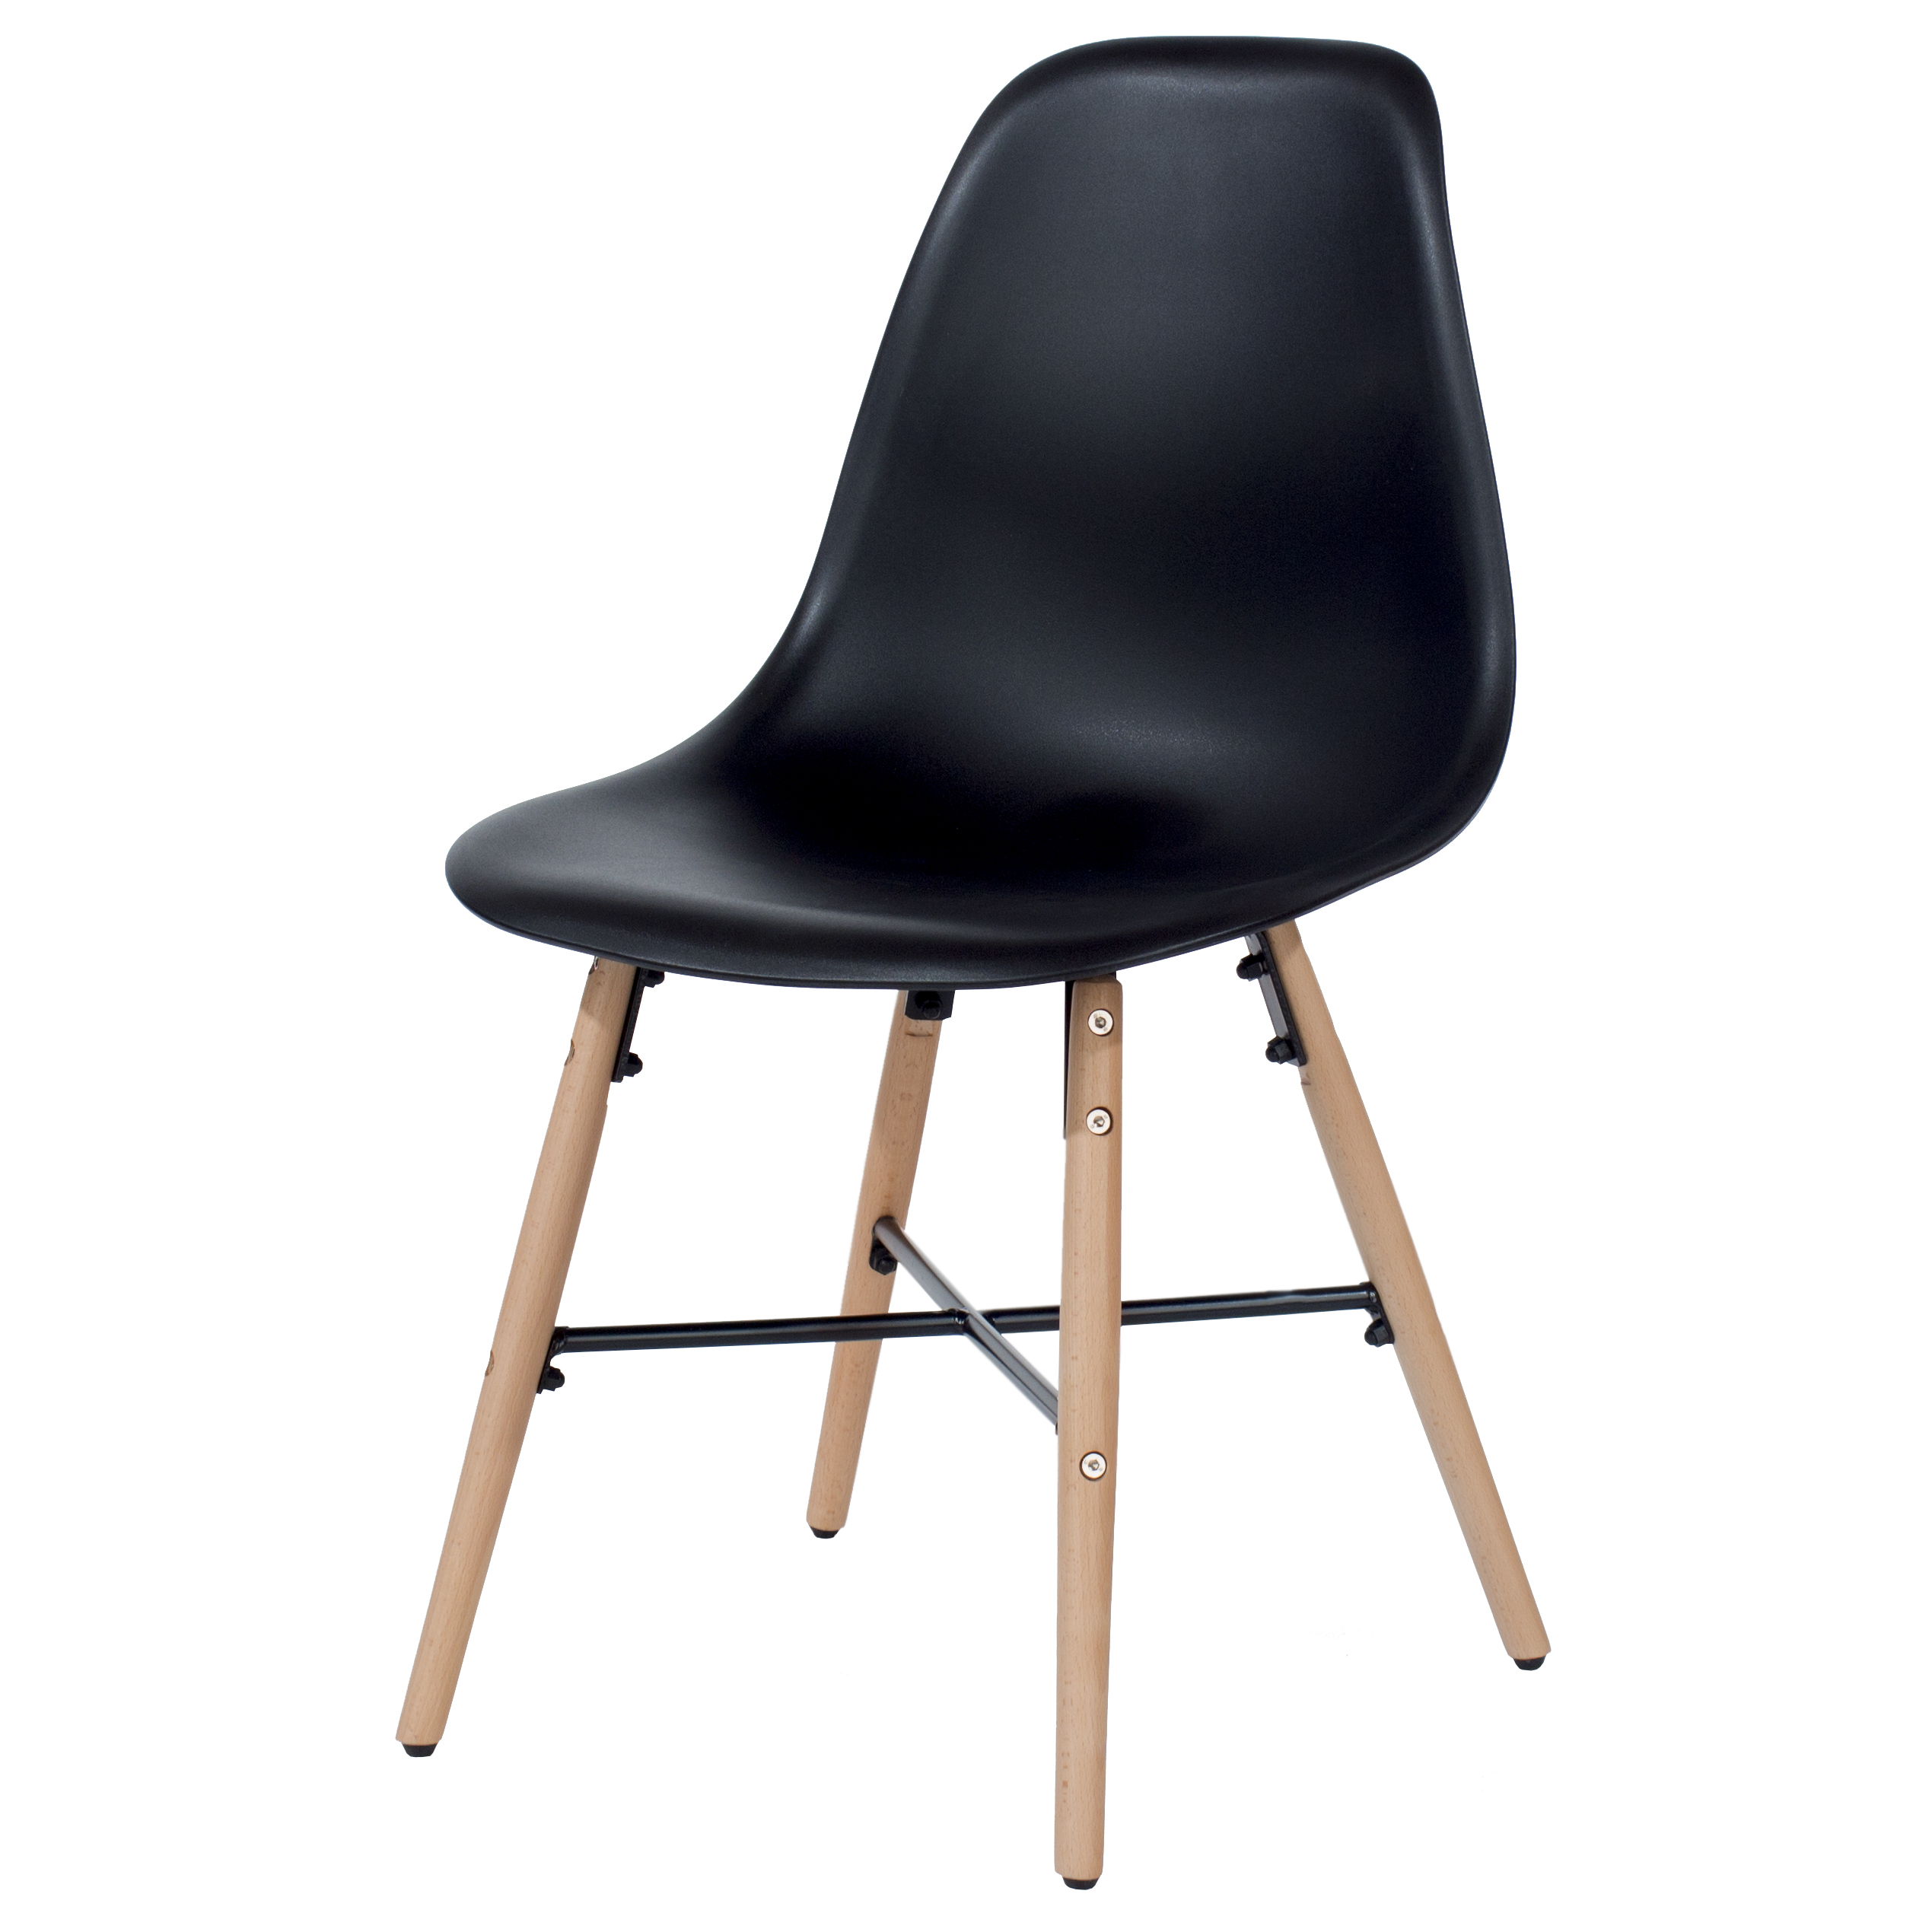 Penny black plastic chairs with wood legs & metal cross rails (pair)